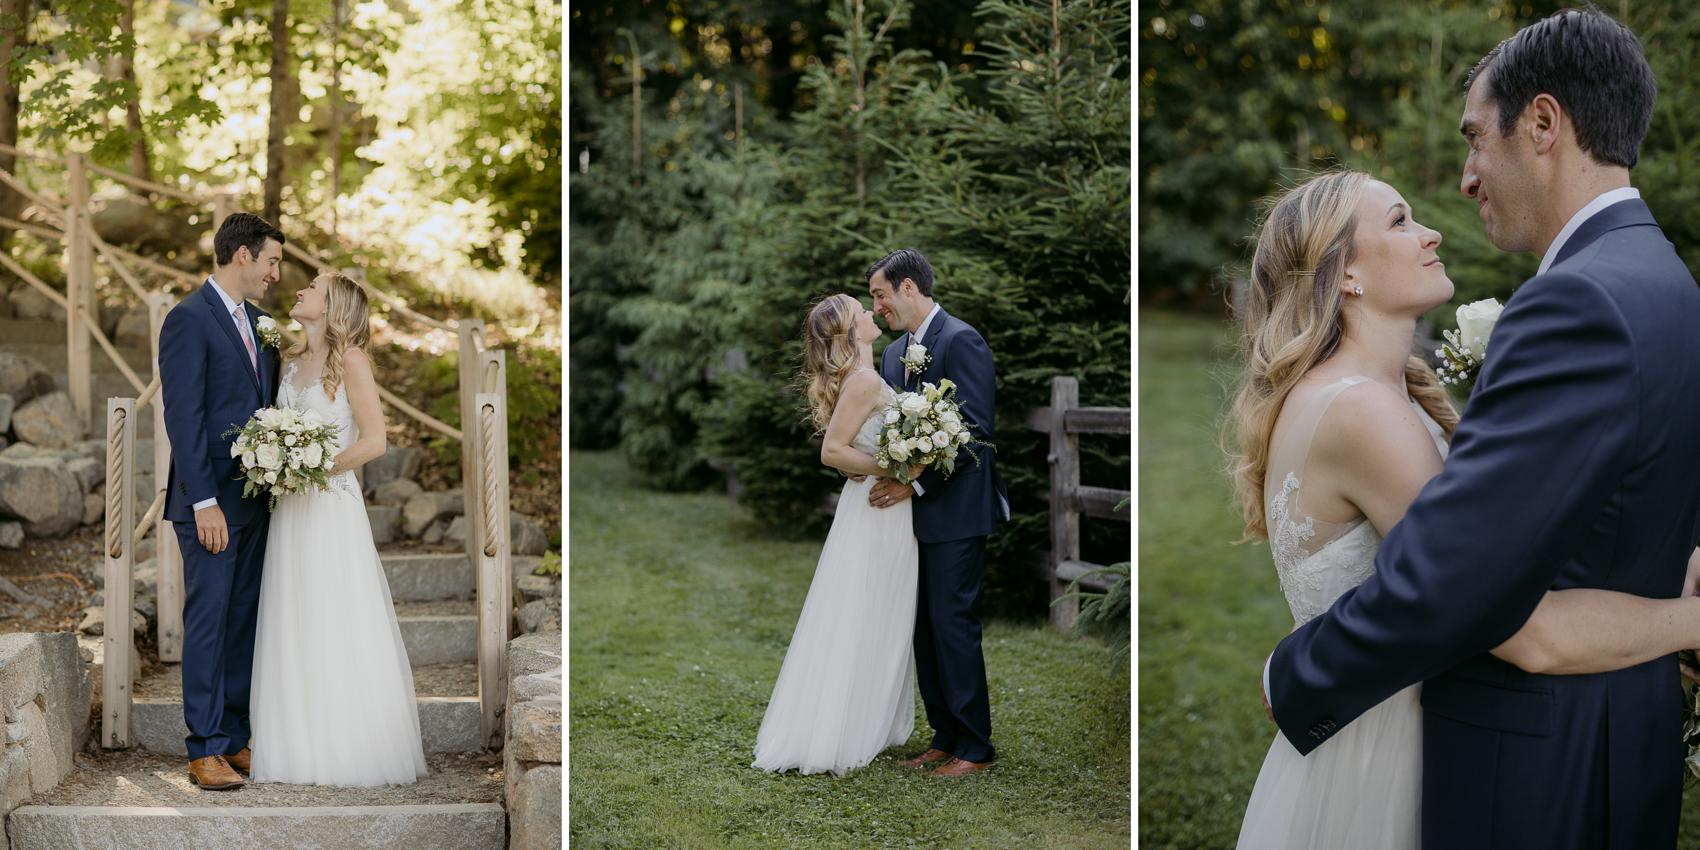 alli_dave_thompson_inn_portsmouth_new_Hampshire_wedding_014.jpg